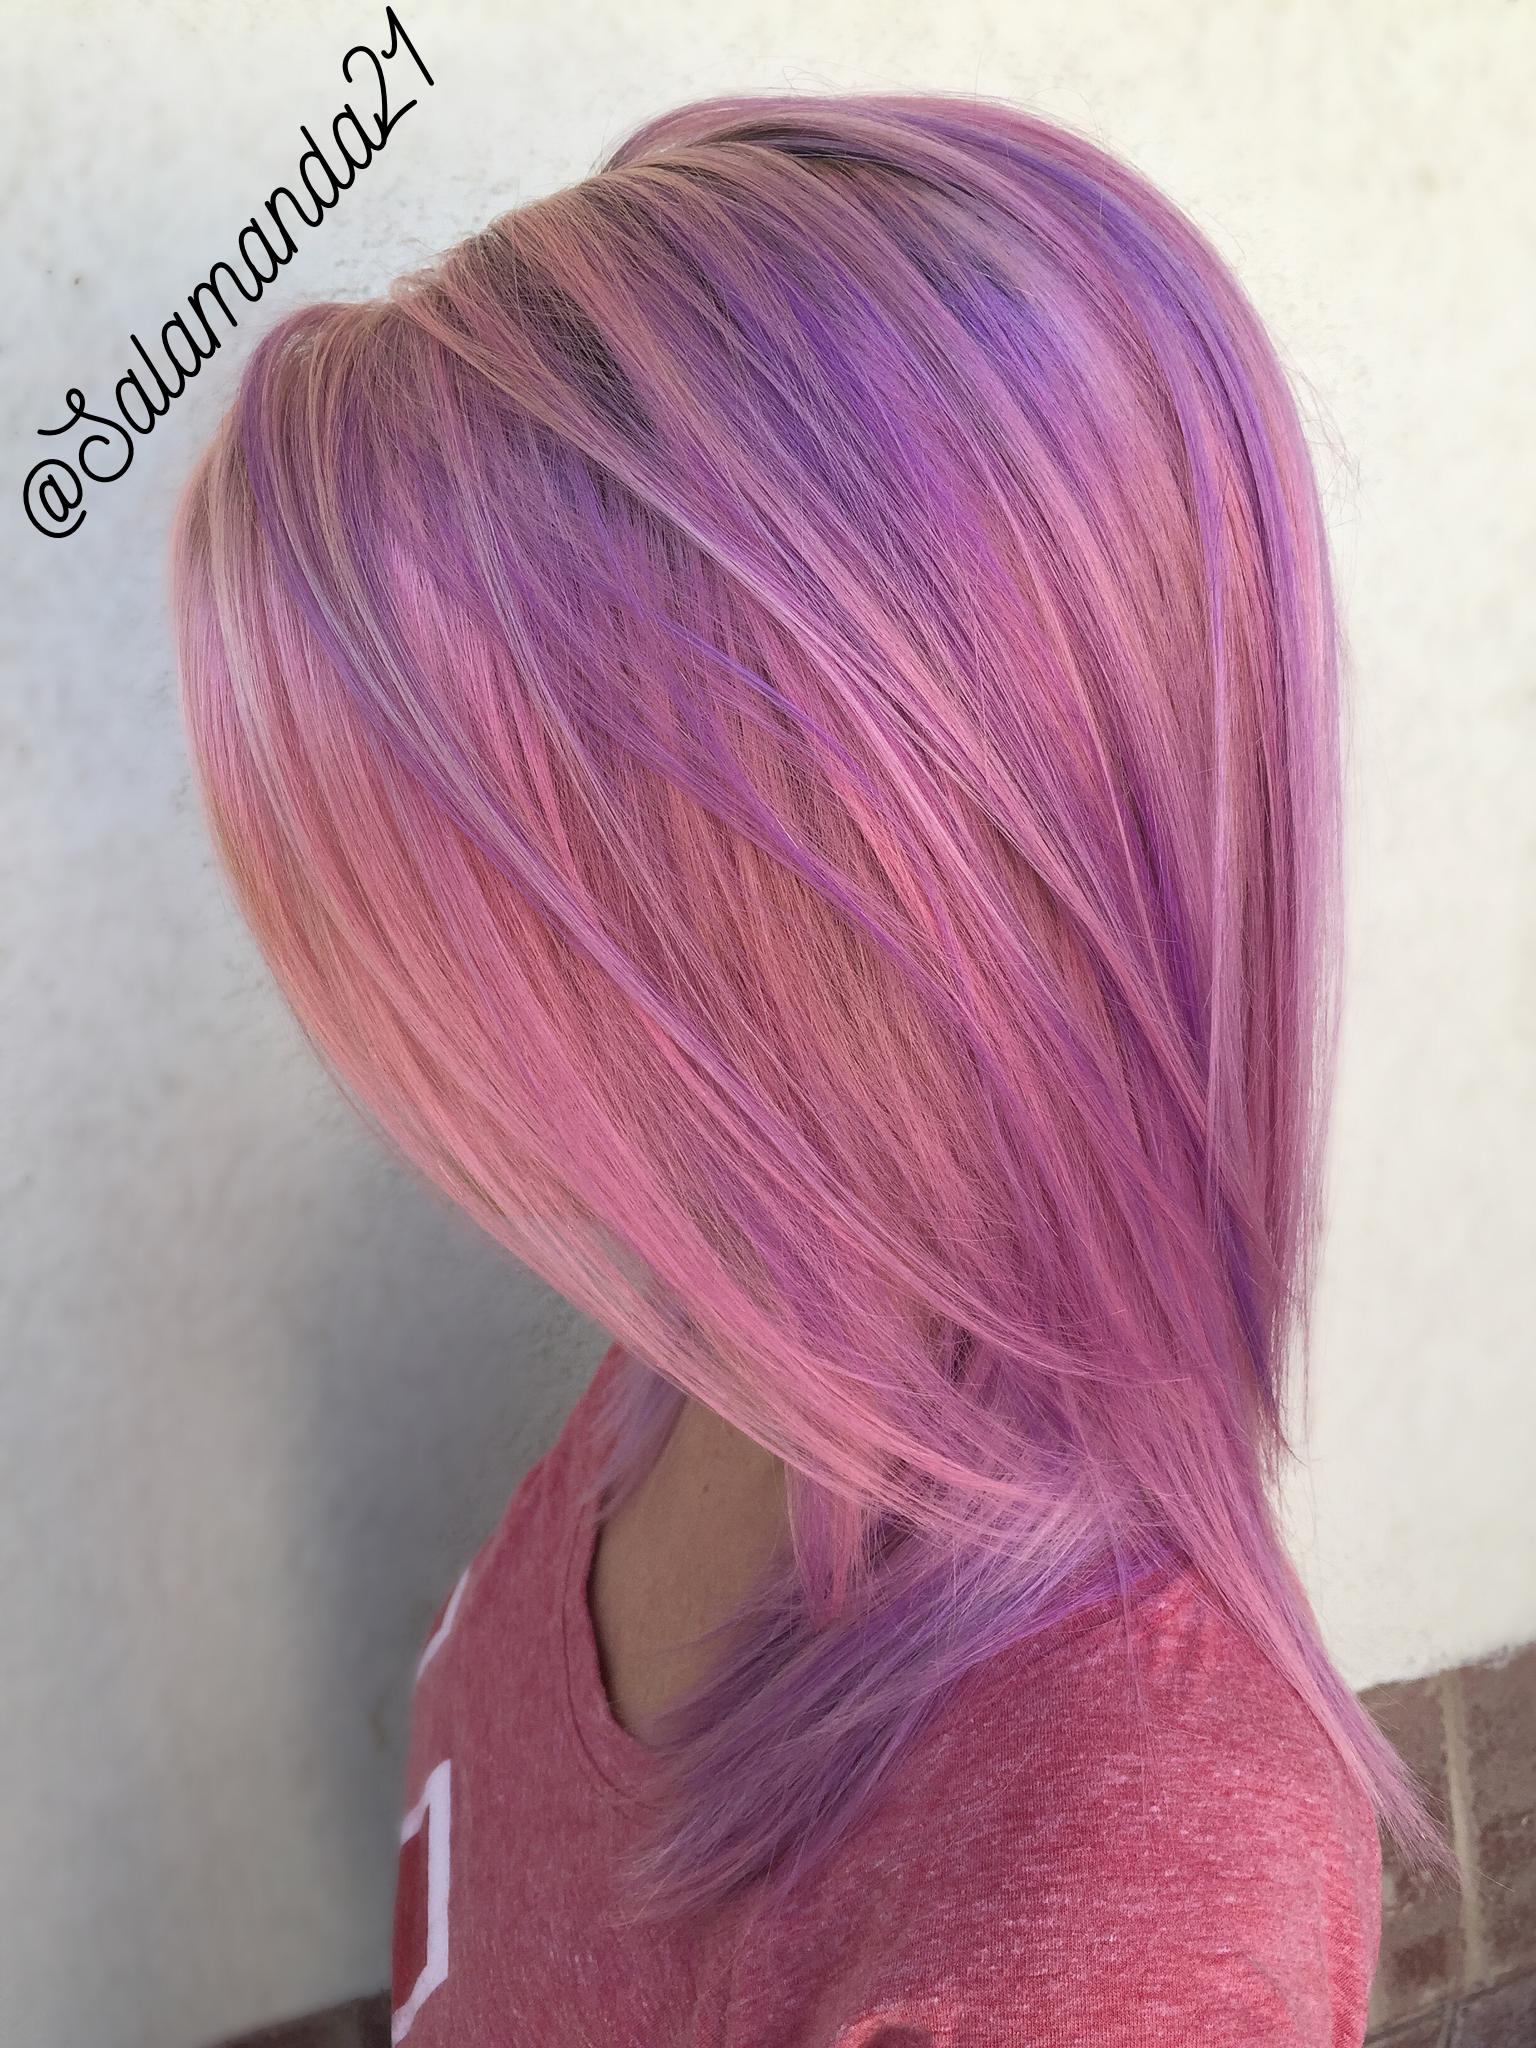 Pink and purple pastel hair done by manda heath salamanda hair